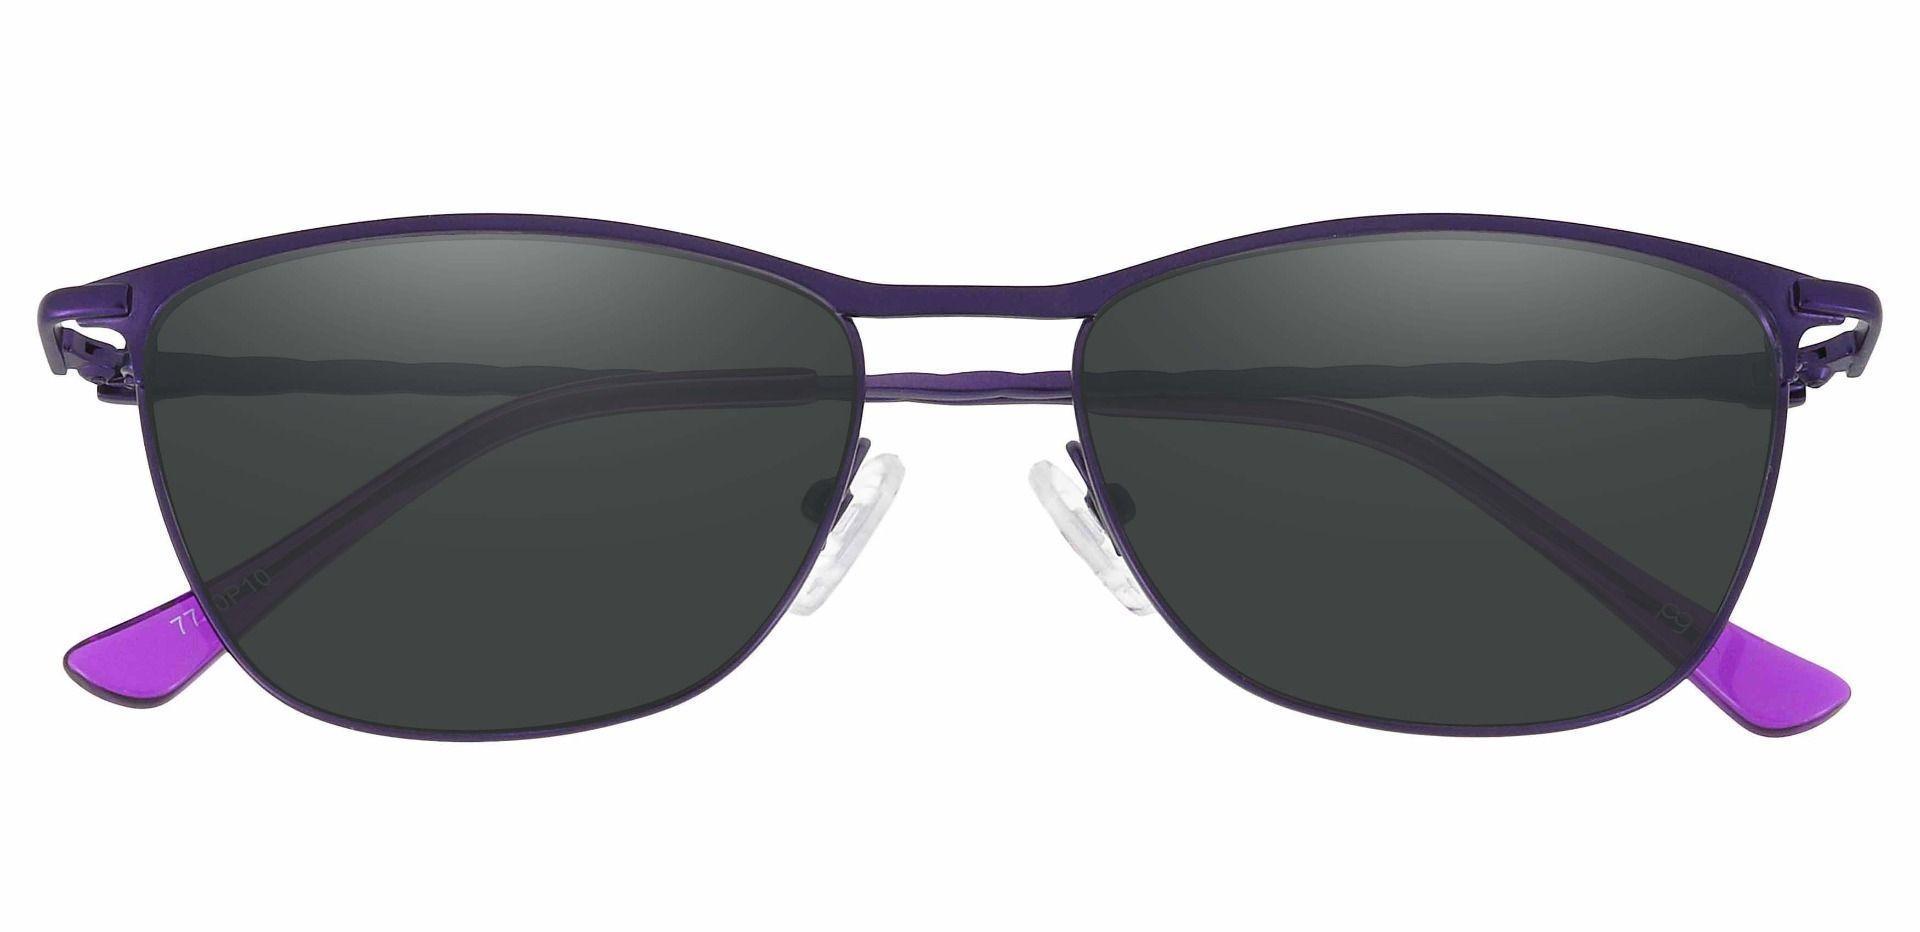 Andrea Cat Eye Prescription Sunglasses - Purple Frame With Gray Lenses